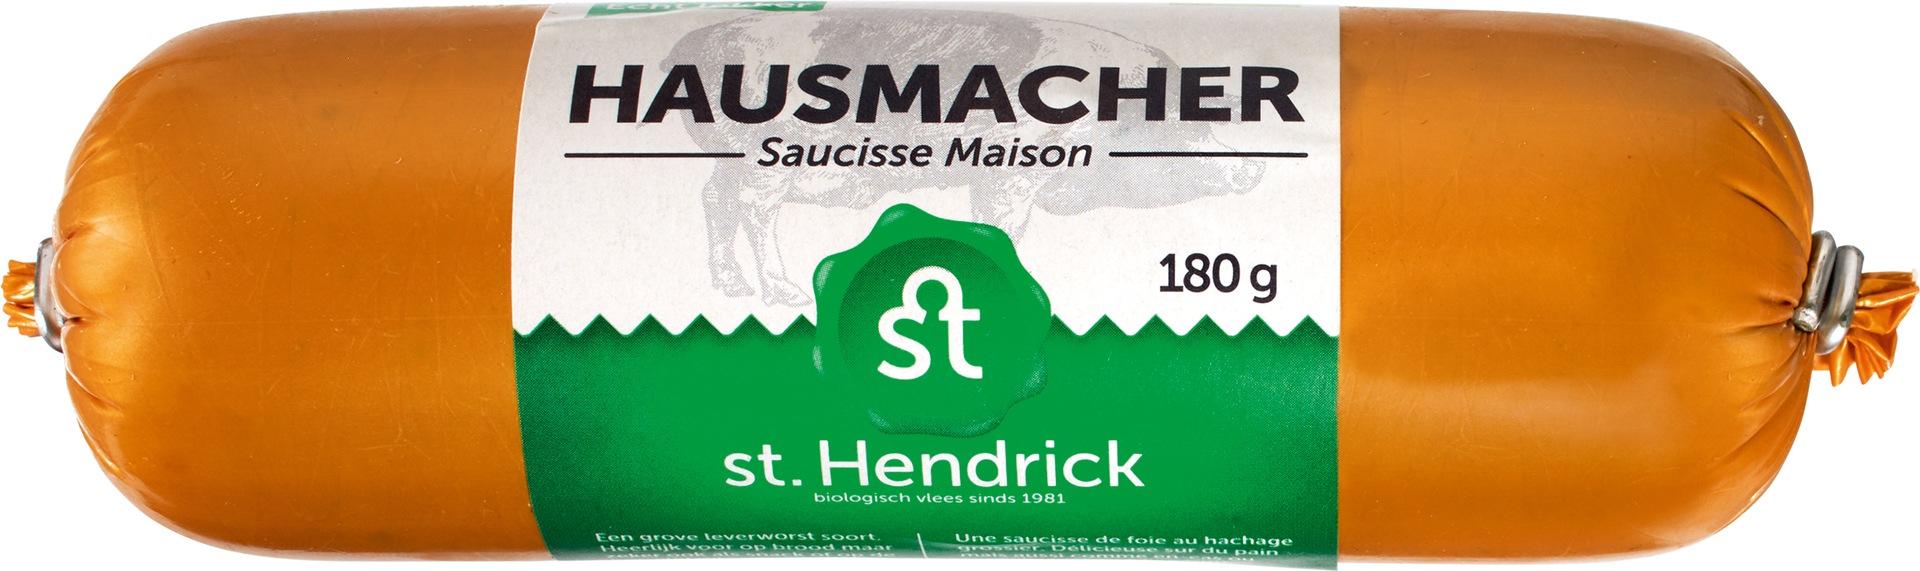 Biologische St. Hendrick Hausmacher leverworst 180 gr